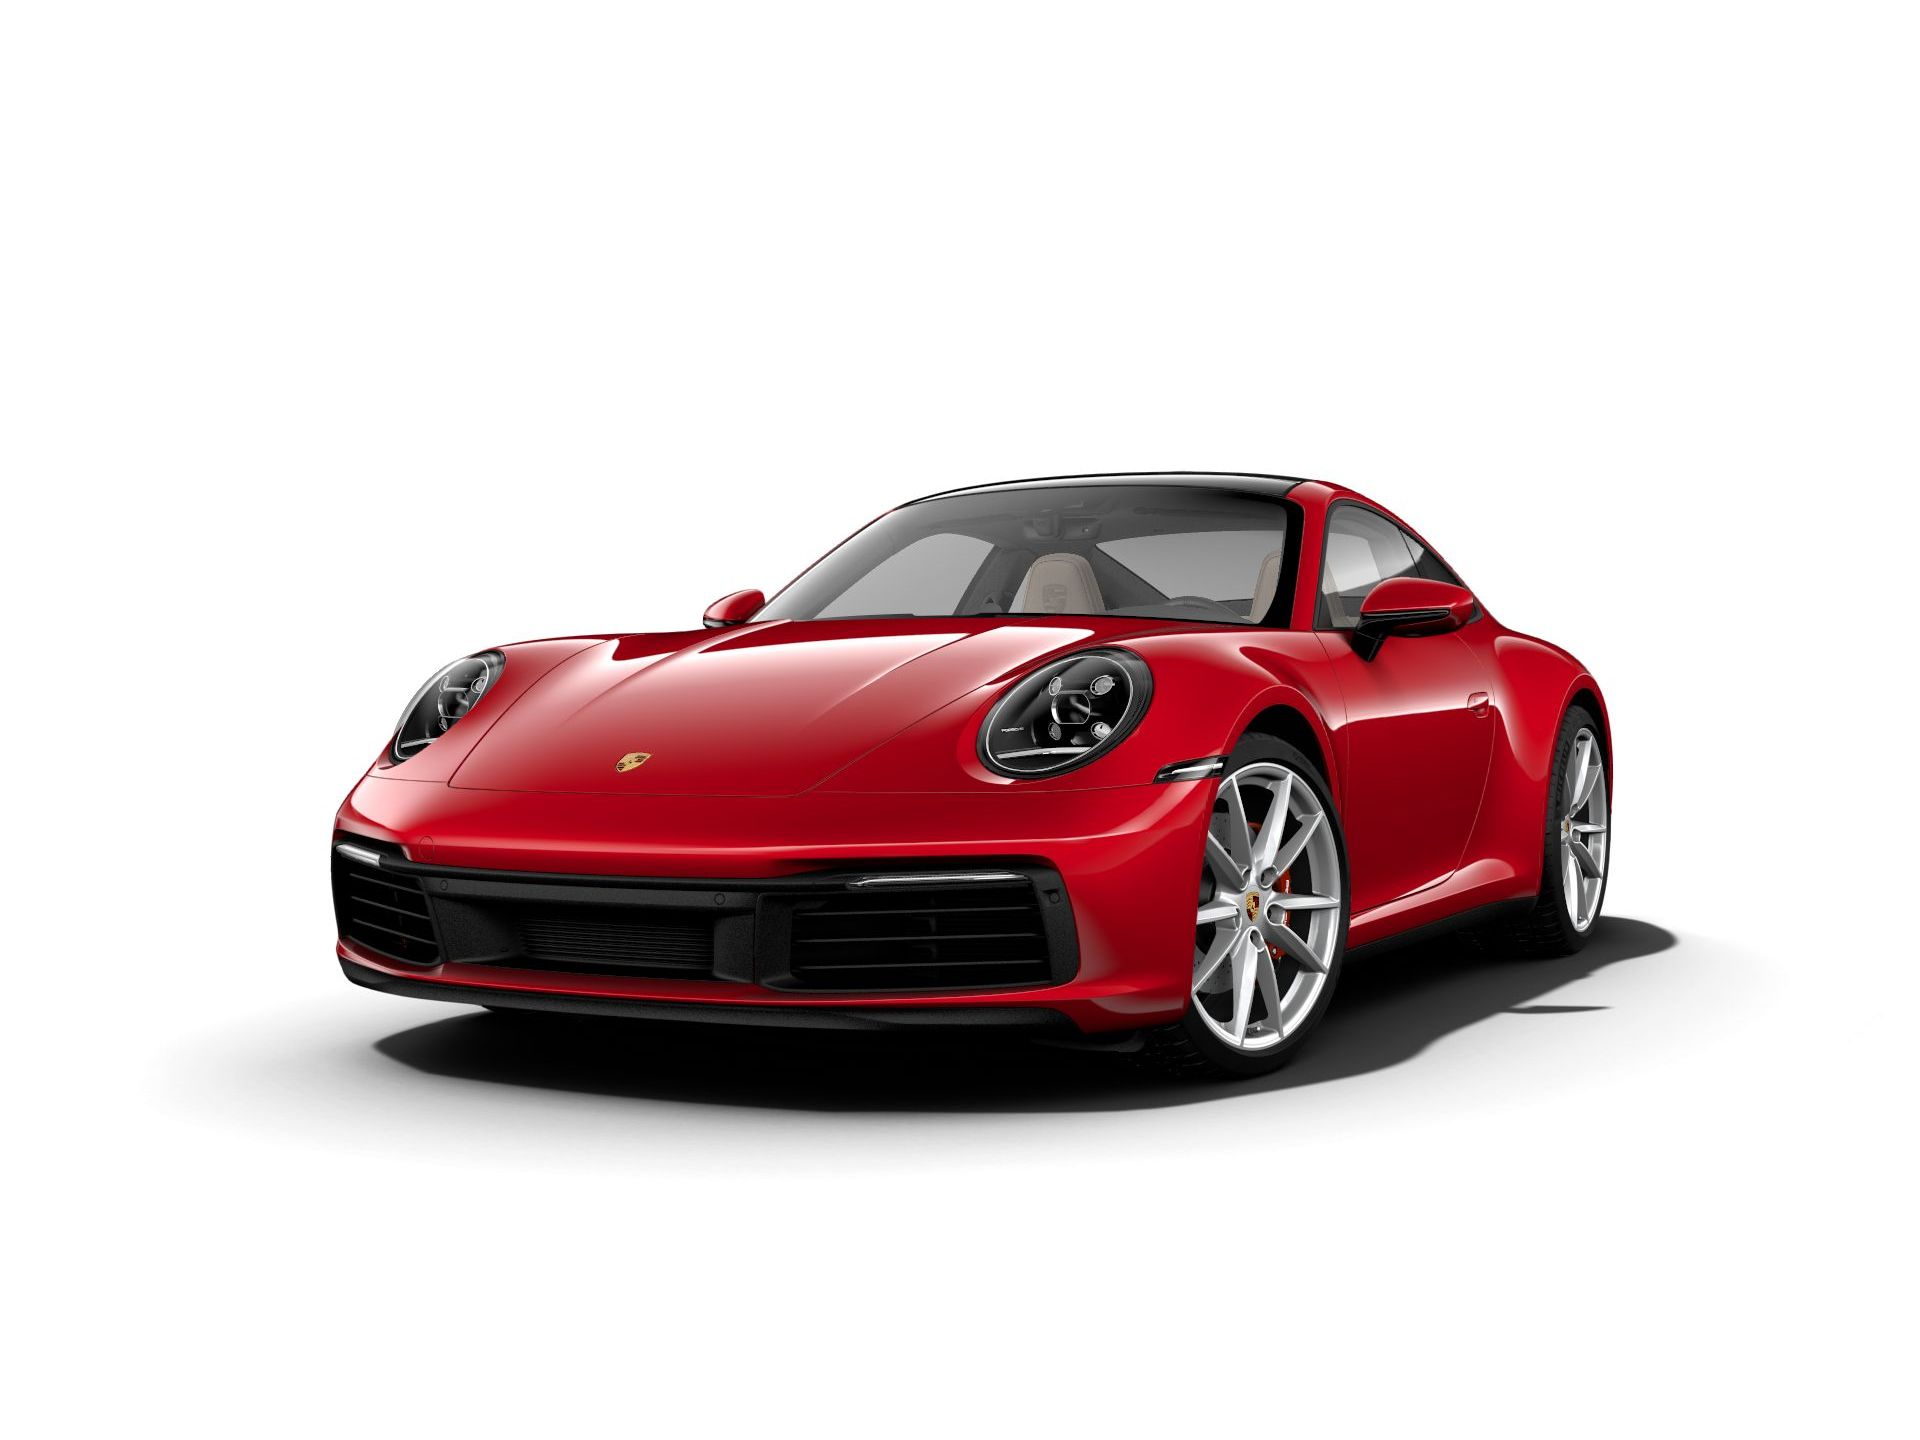 2020 Porsche 911 Carrera 4S (992) – 1